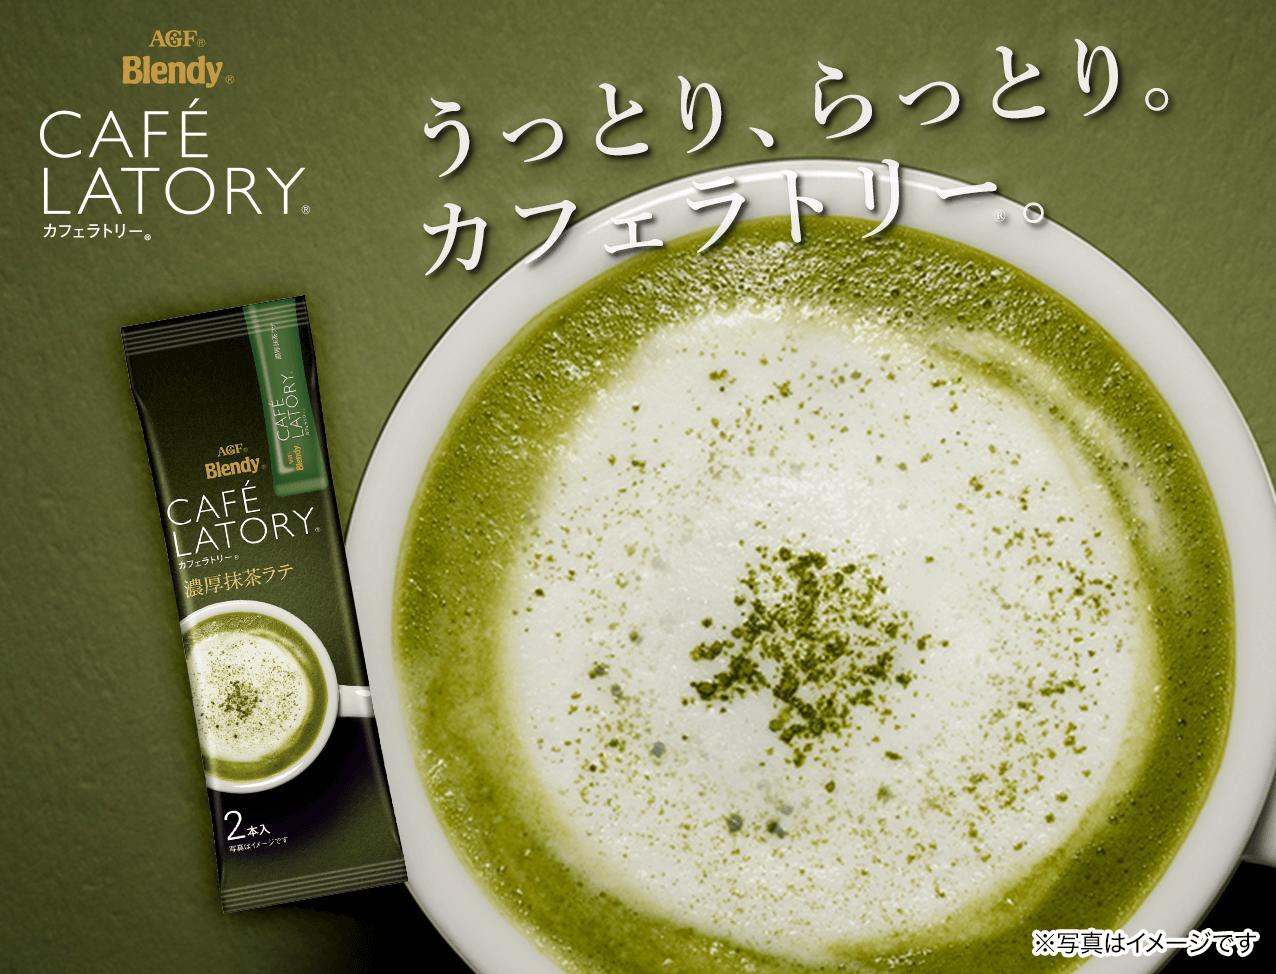 Blendy CAFE LATORY® うっとり、らっとり。 カフェラトリー®